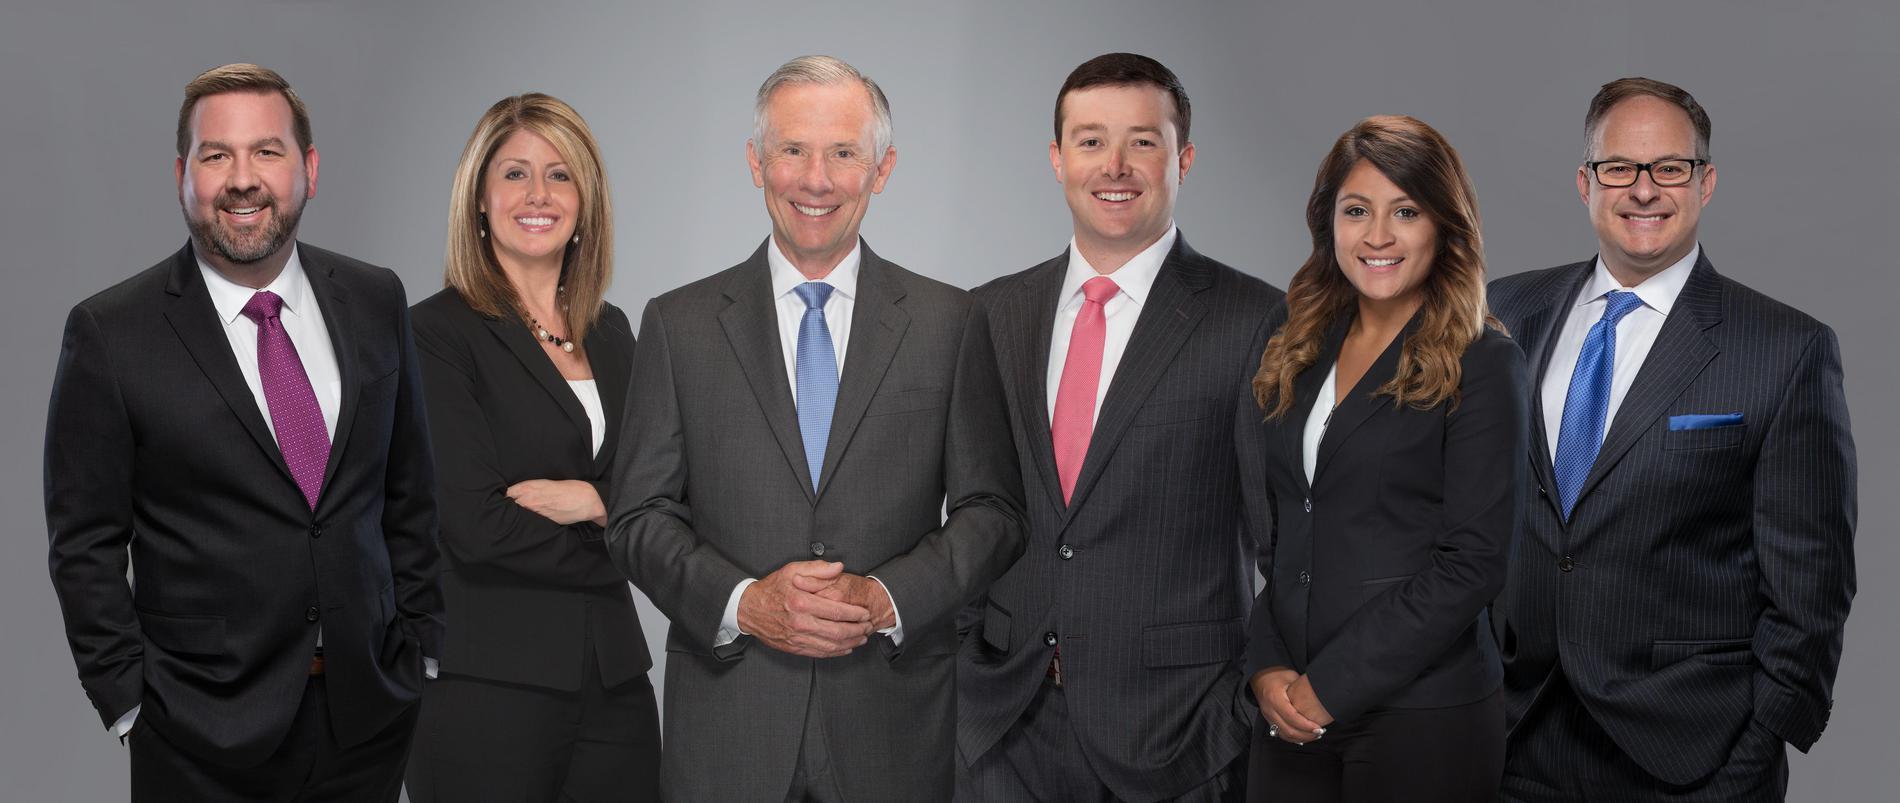 The Fisher Group | Atlanta, GA | Morgan Stanley Wealth